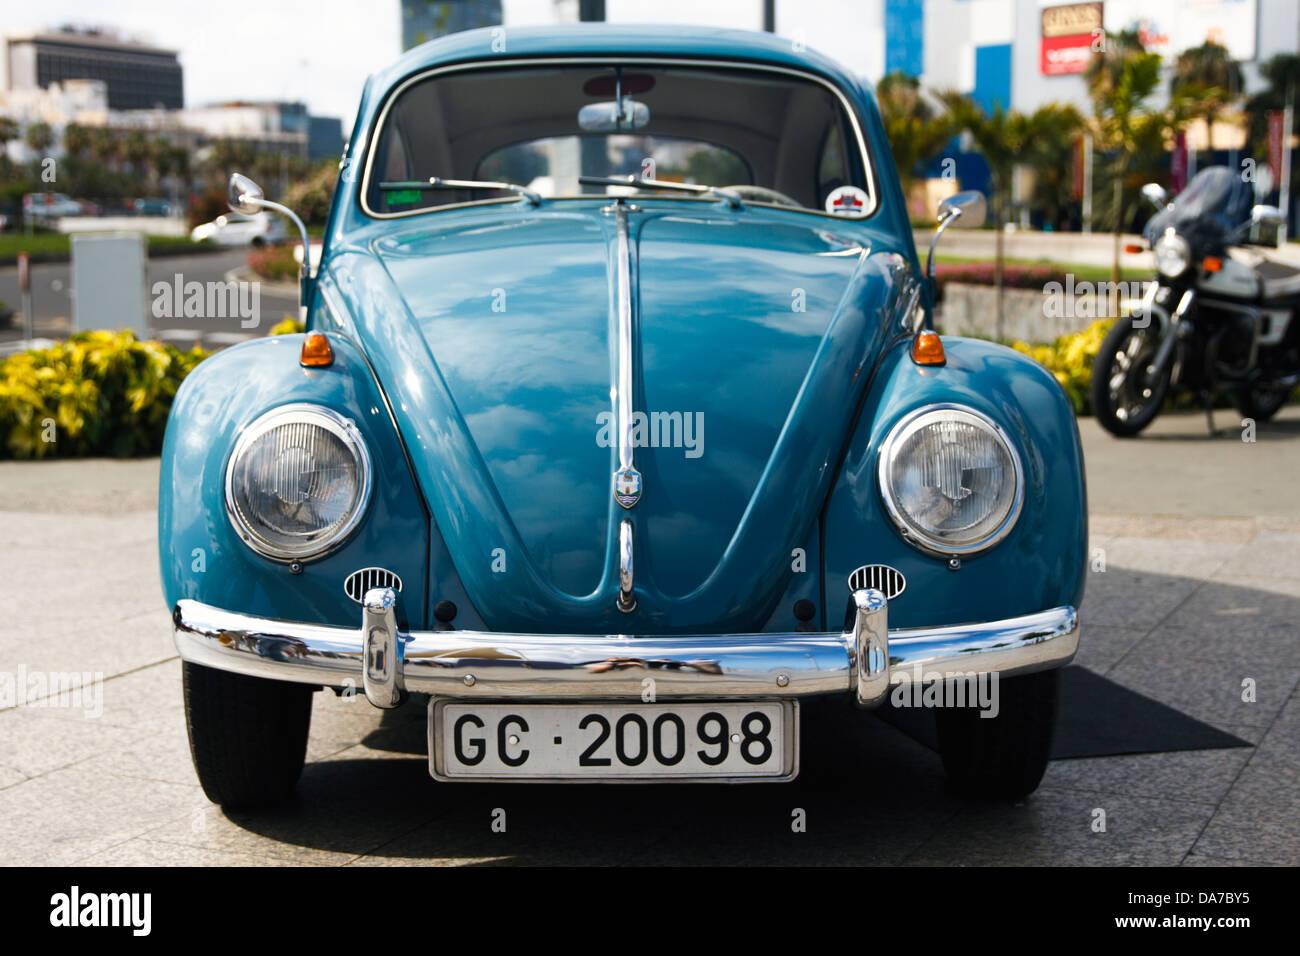 Classic Volkswagen Beetle Car Stock Photo Alamy